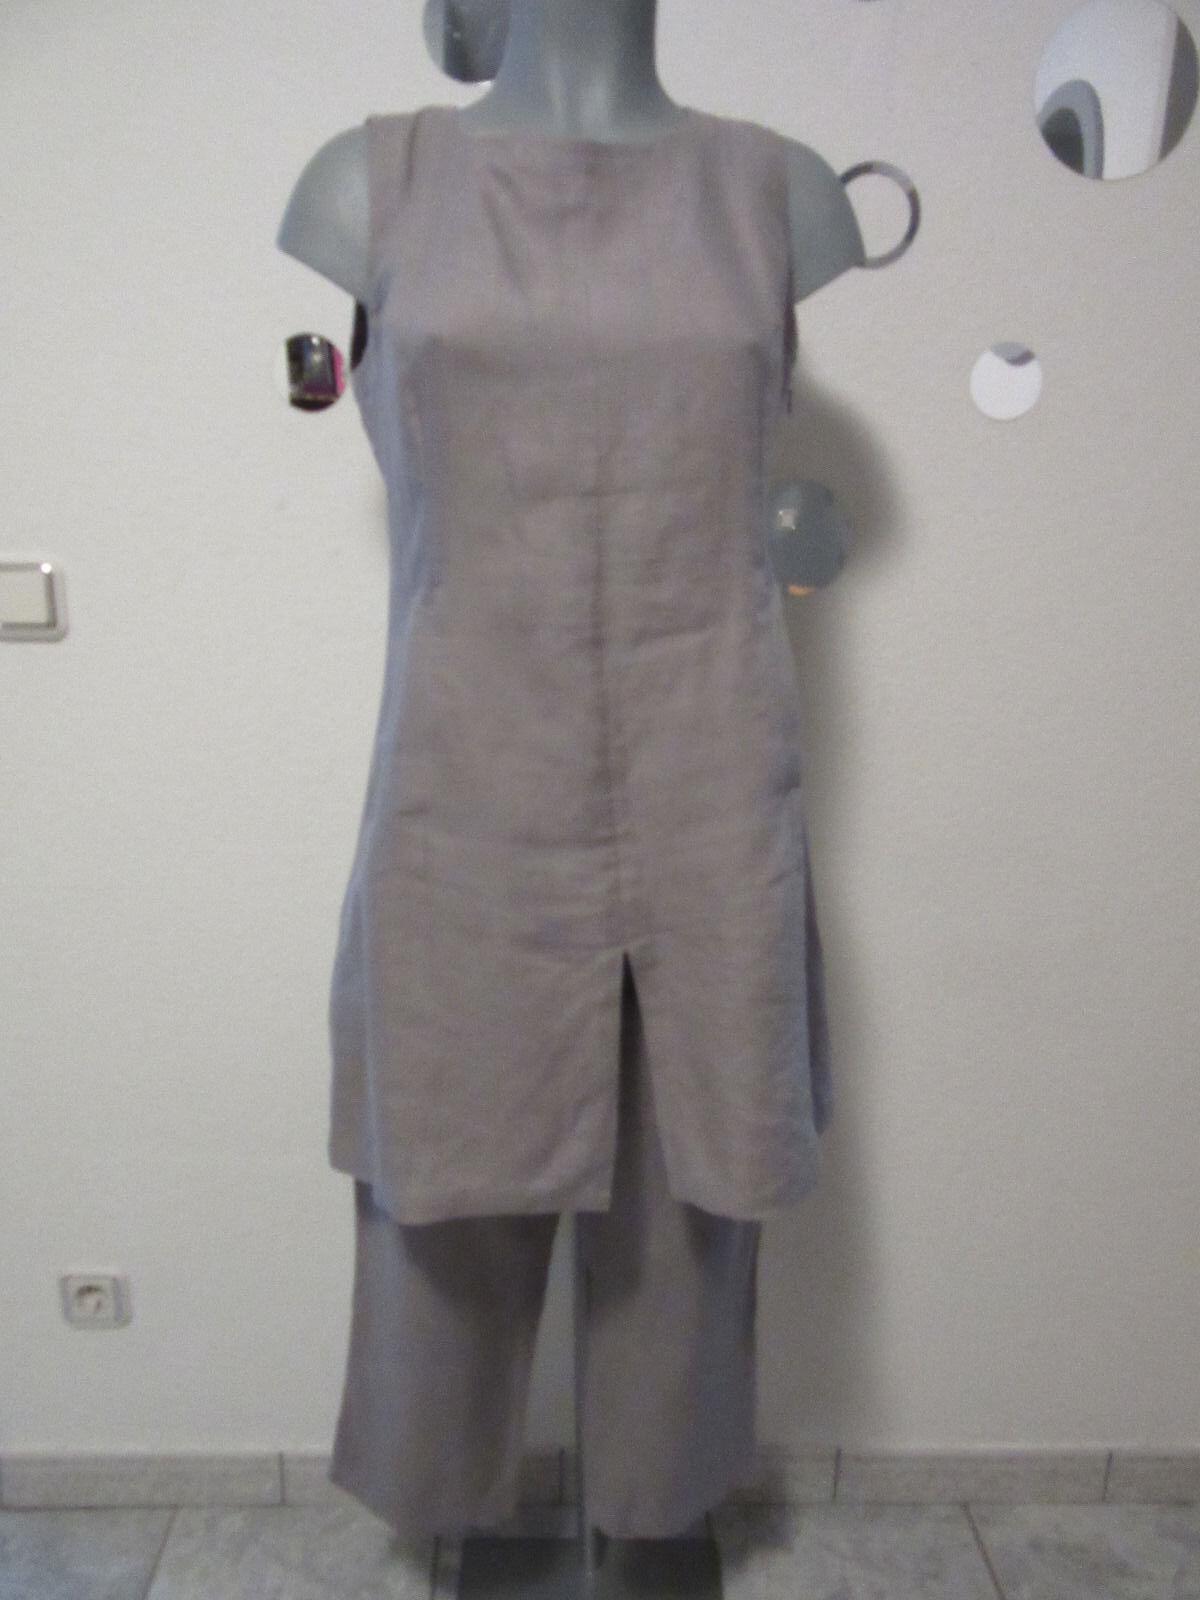 Enna,Waschbär der Umweltversand,100%Leinen, Tunika + Hose,Farbe Grau,NP